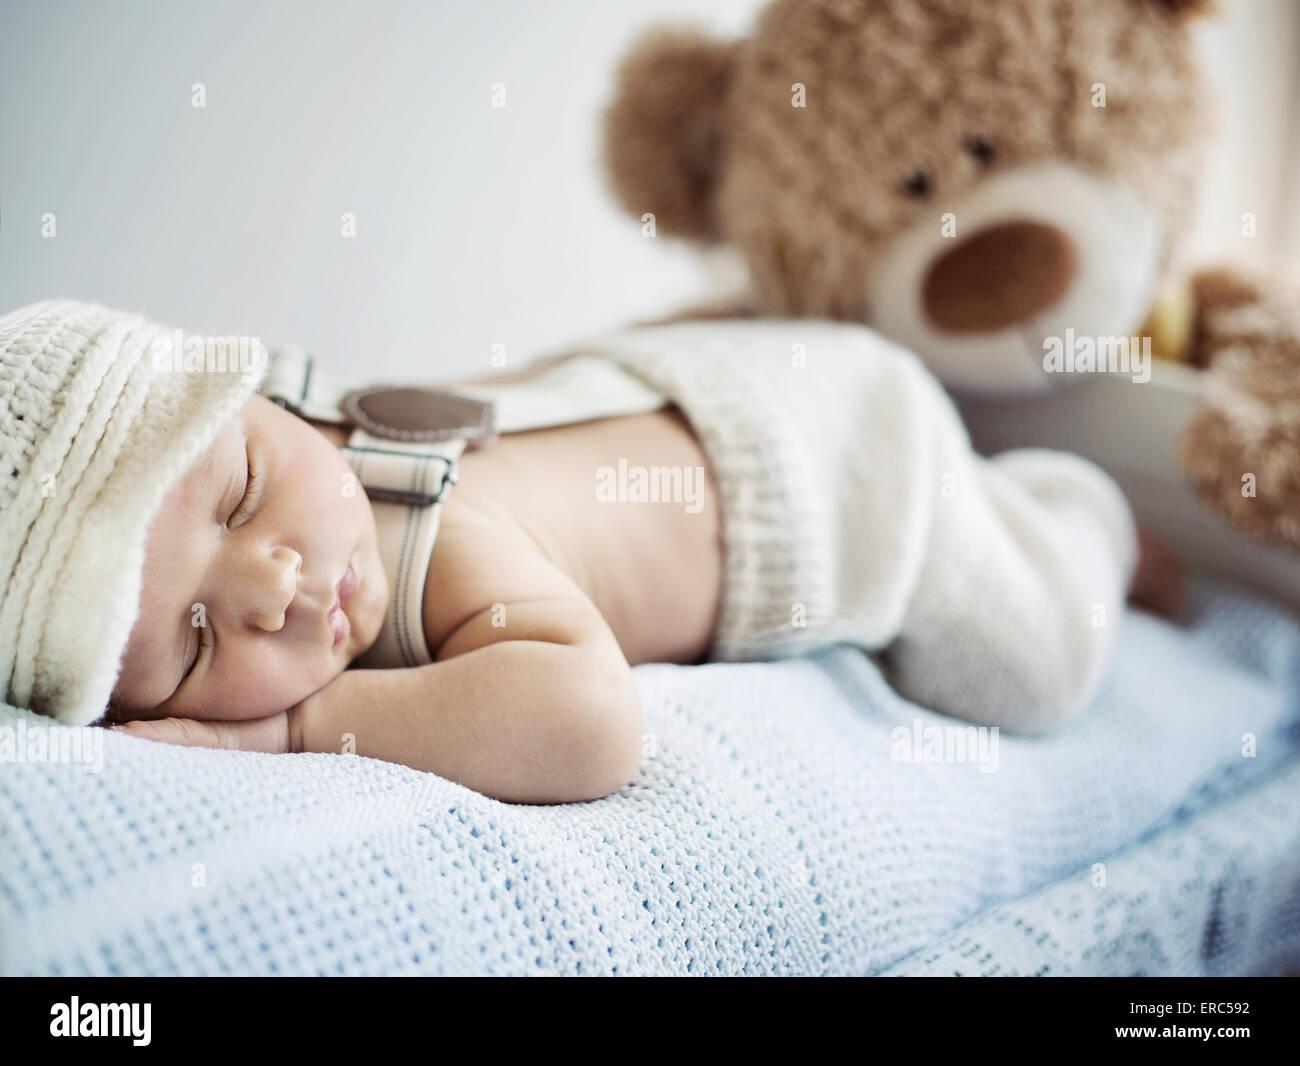 Niño recién nacido duerme con un oso de peluche Foto de stock